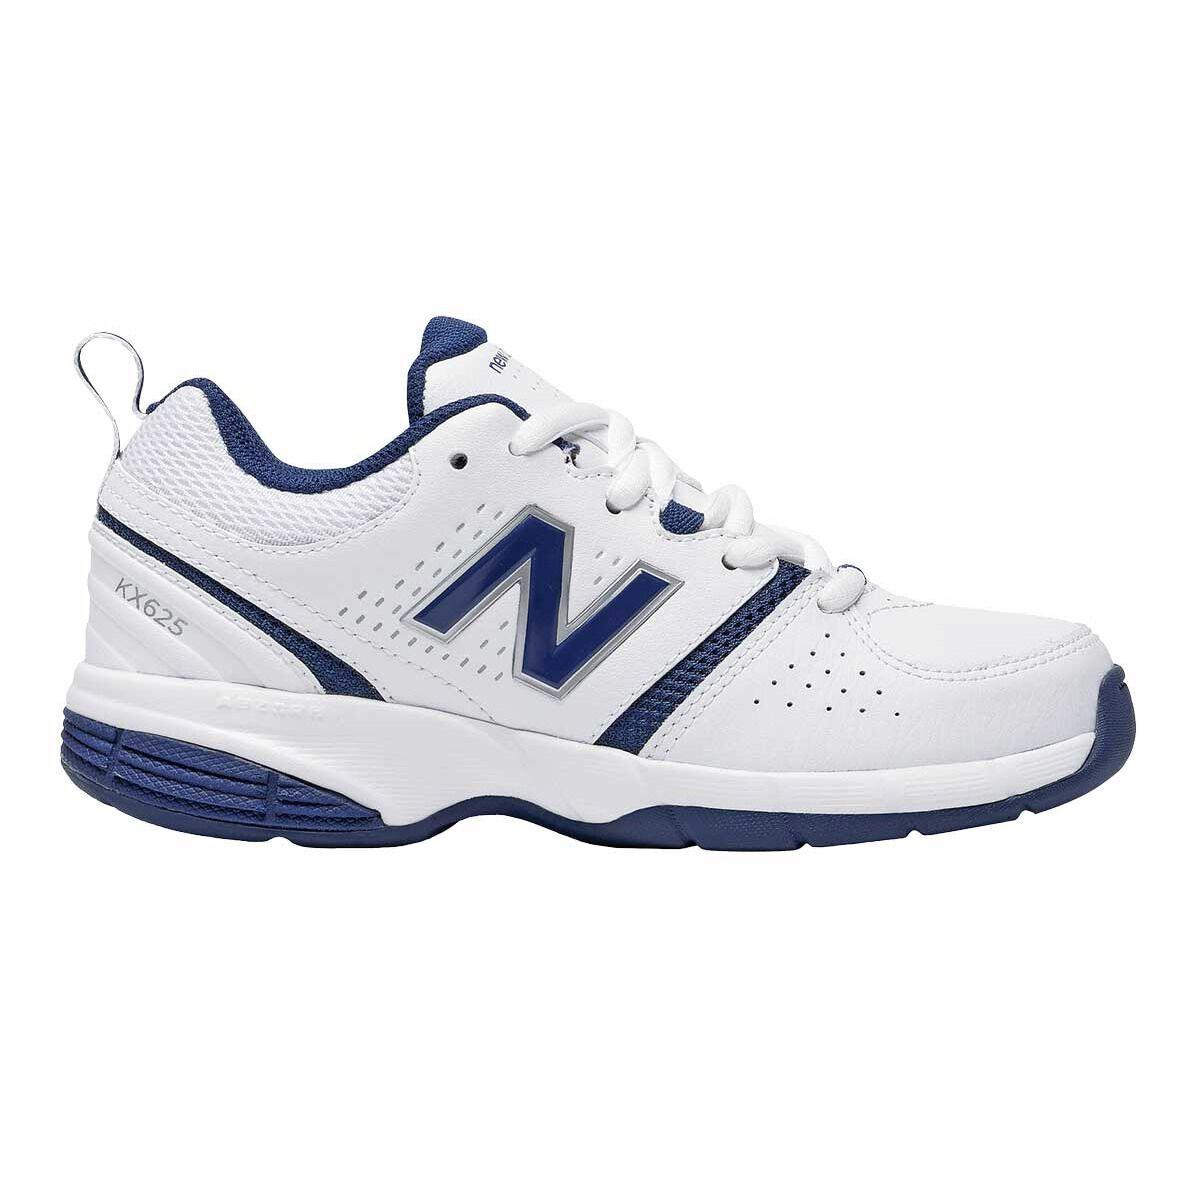 Balance 625 Boys Cross Training Shoes